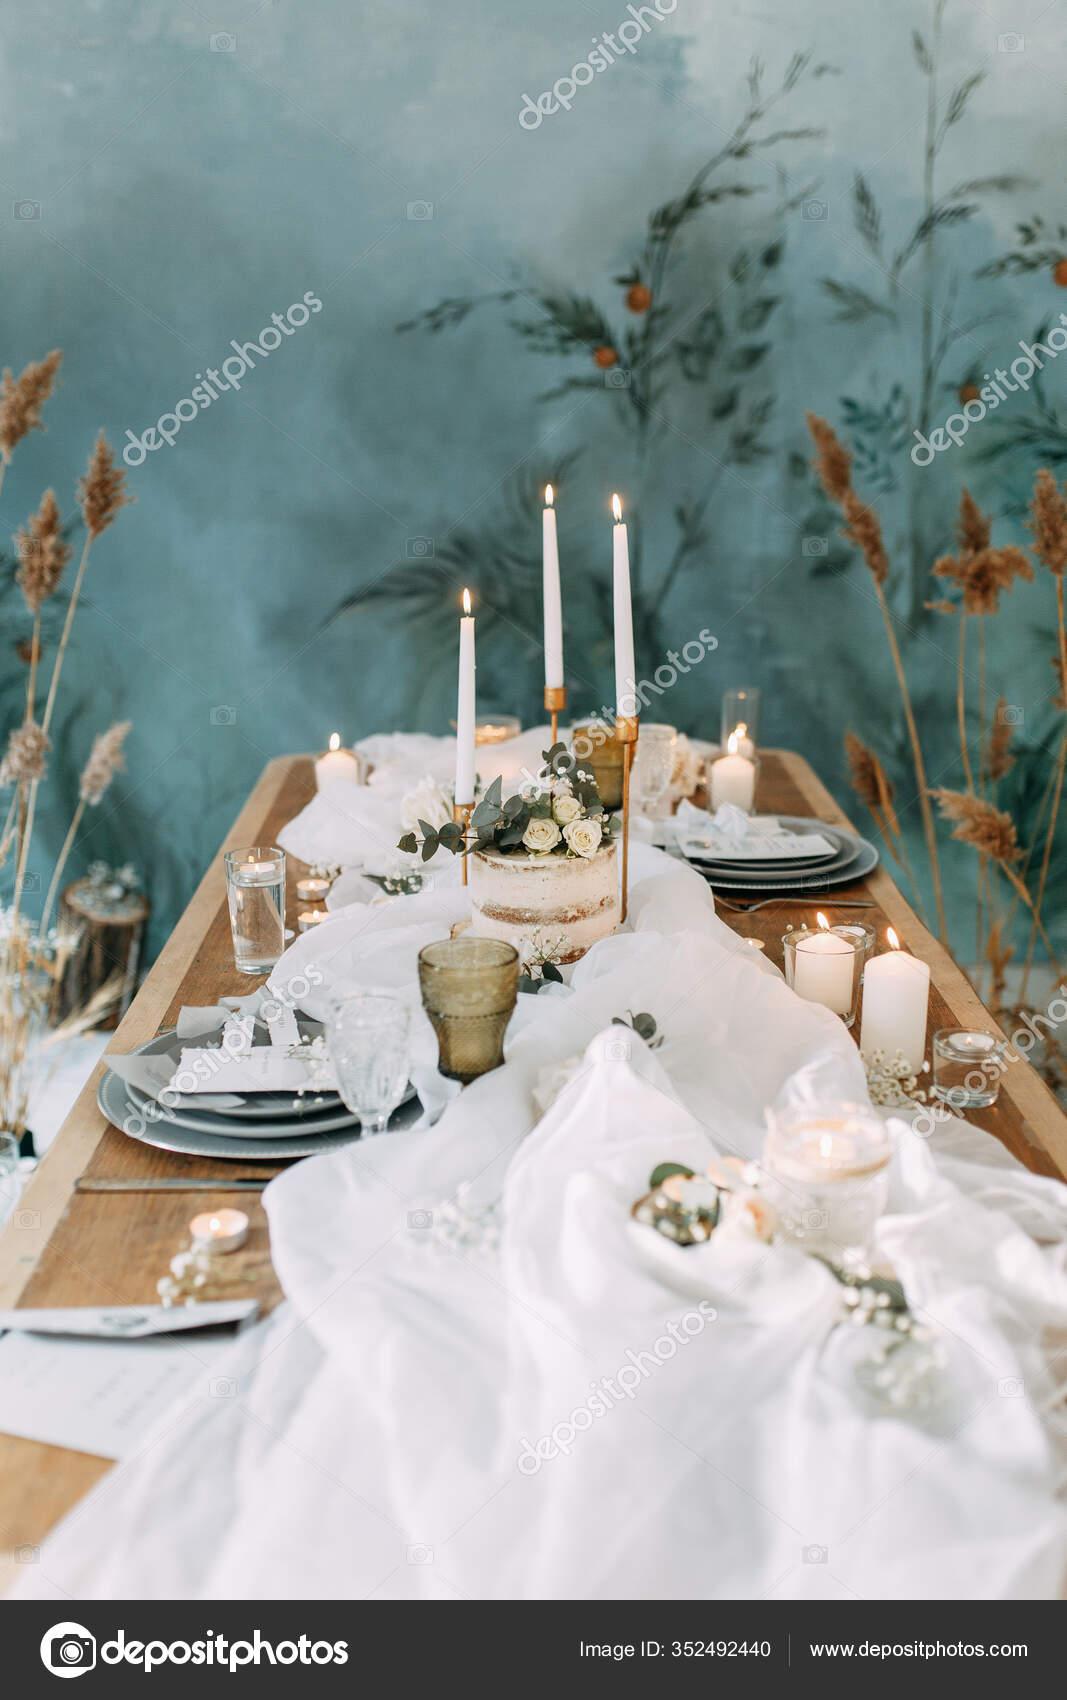 Autumn Decor Fabric Dried Flowers Wedding Style Fine Art Wedding Stock Photo C Pavelvozmischev 352492440